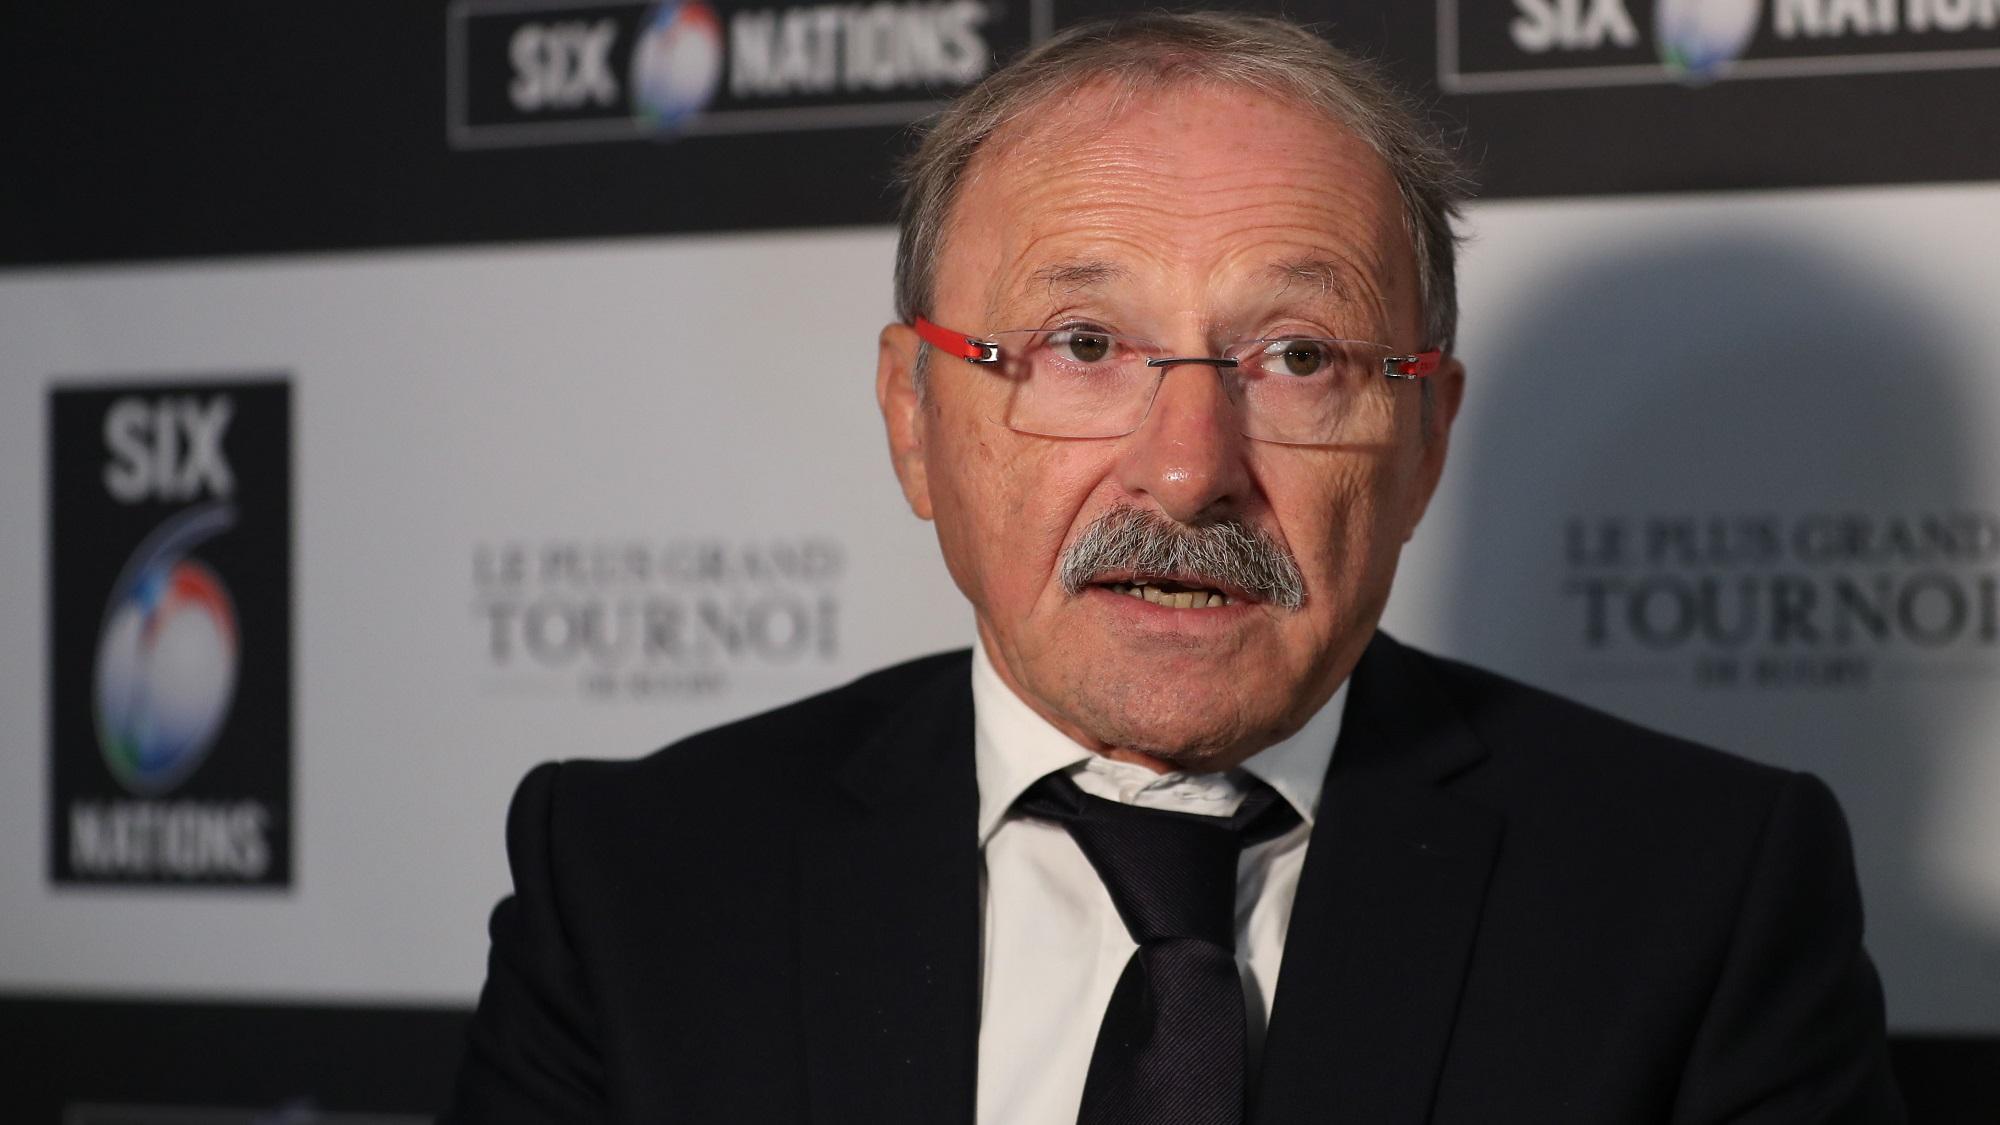 Brunel: Fast start is key for France's Championship hopes